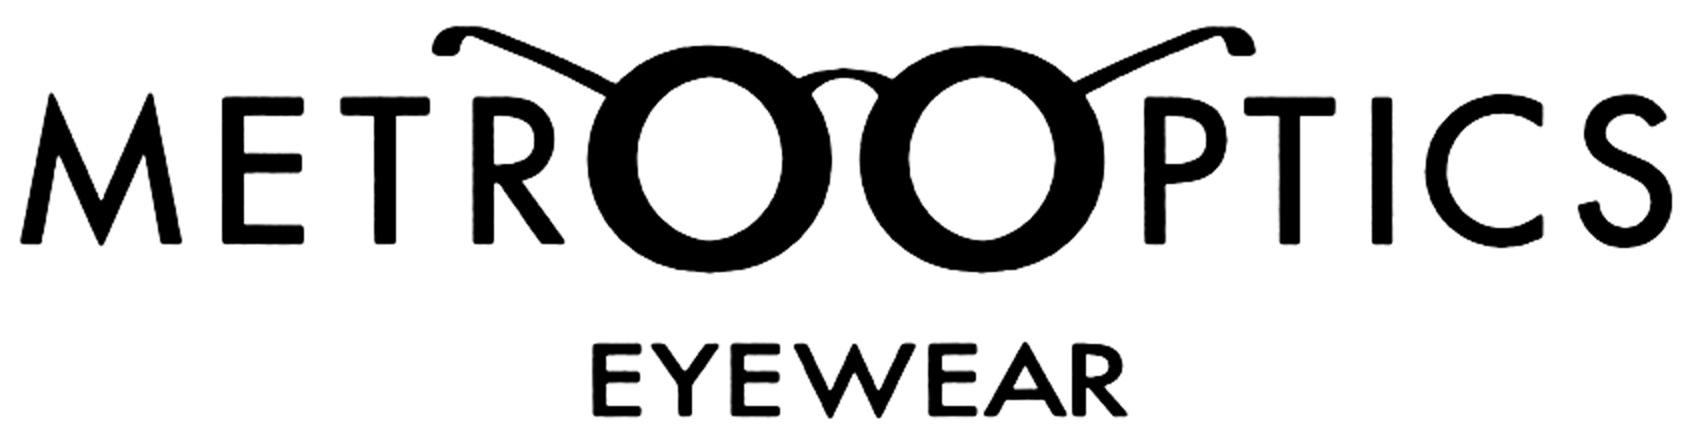 Metro Optics Contact Lens Image